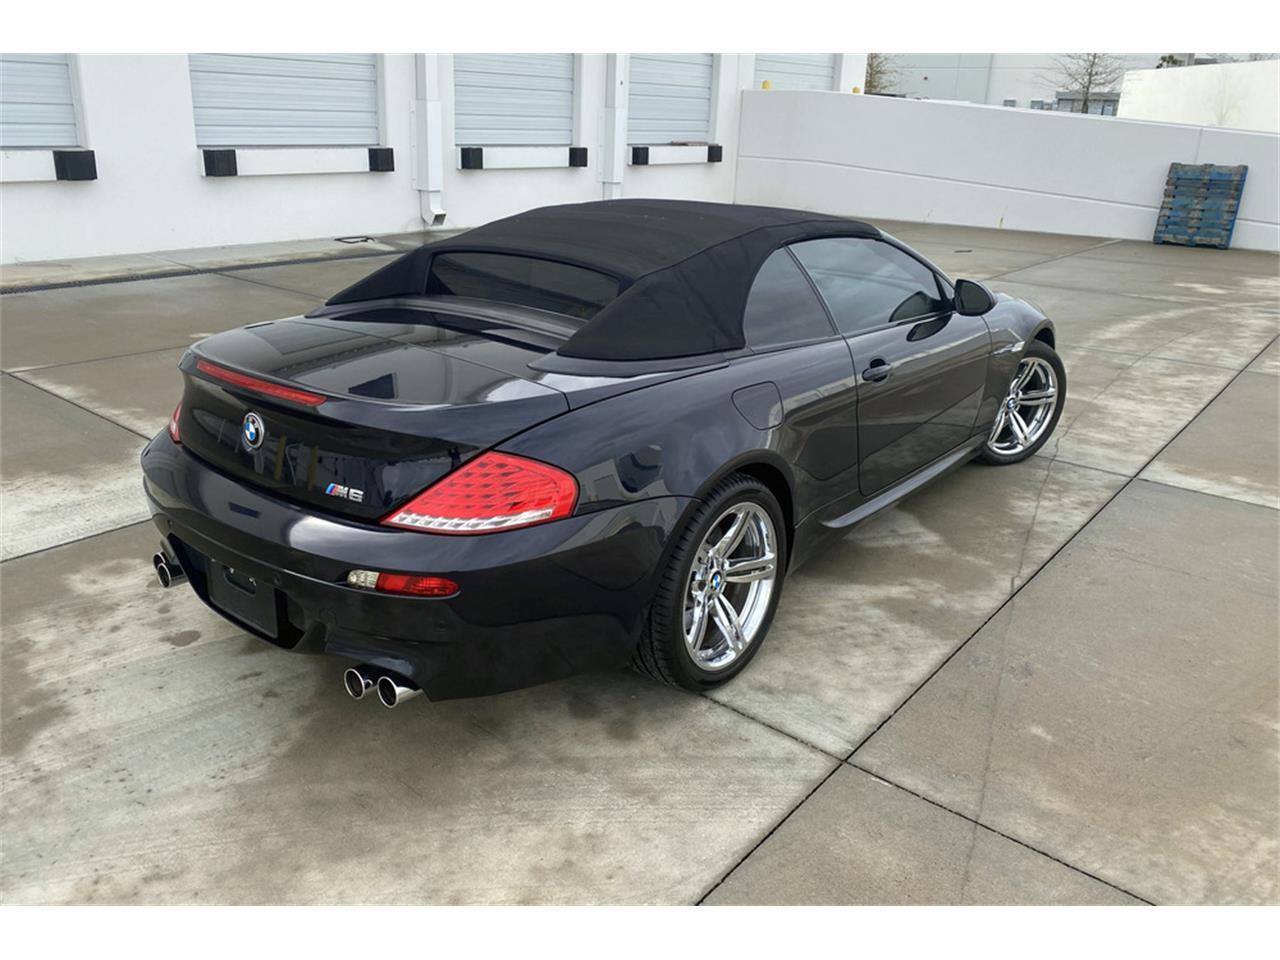 2010 BMW M6 (CC-1309050) for sale in Scottsdale, Arizona